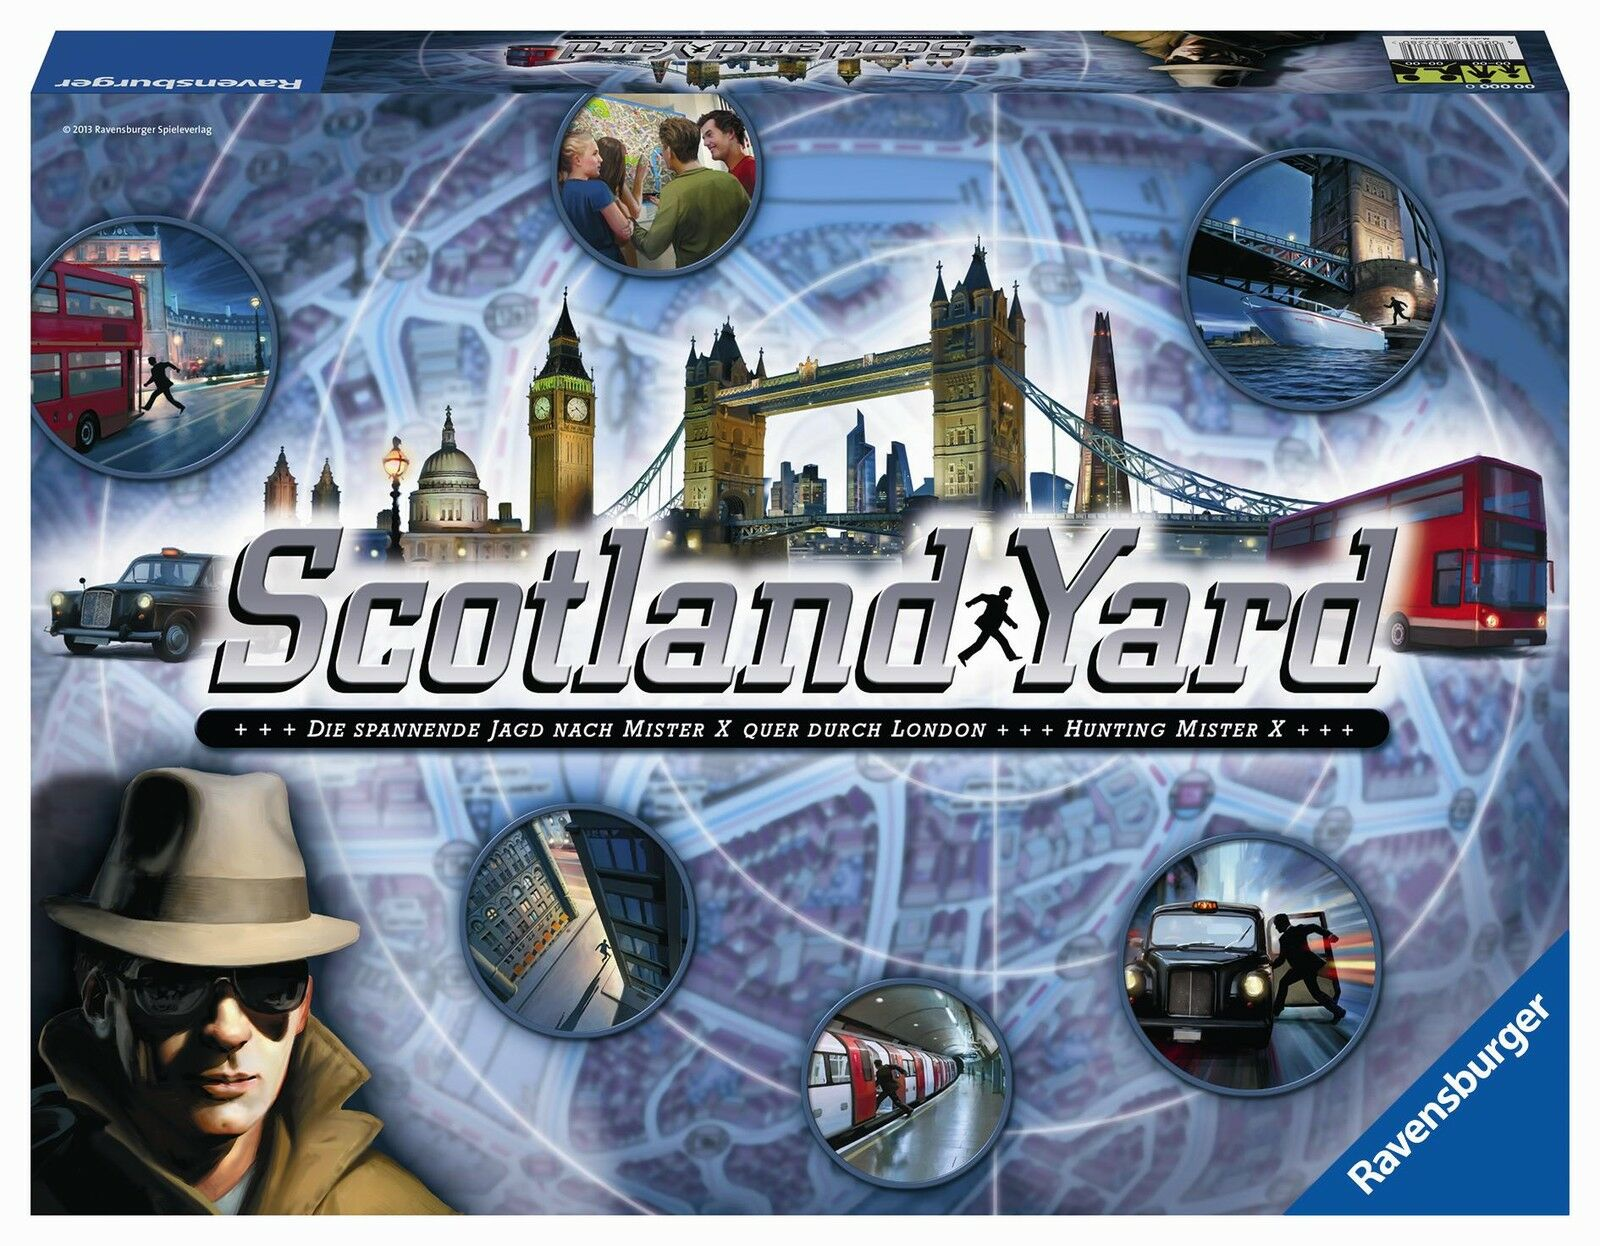 Ravensburger 26601 - Scotland Yard, Nuovo   Conf. Orig.